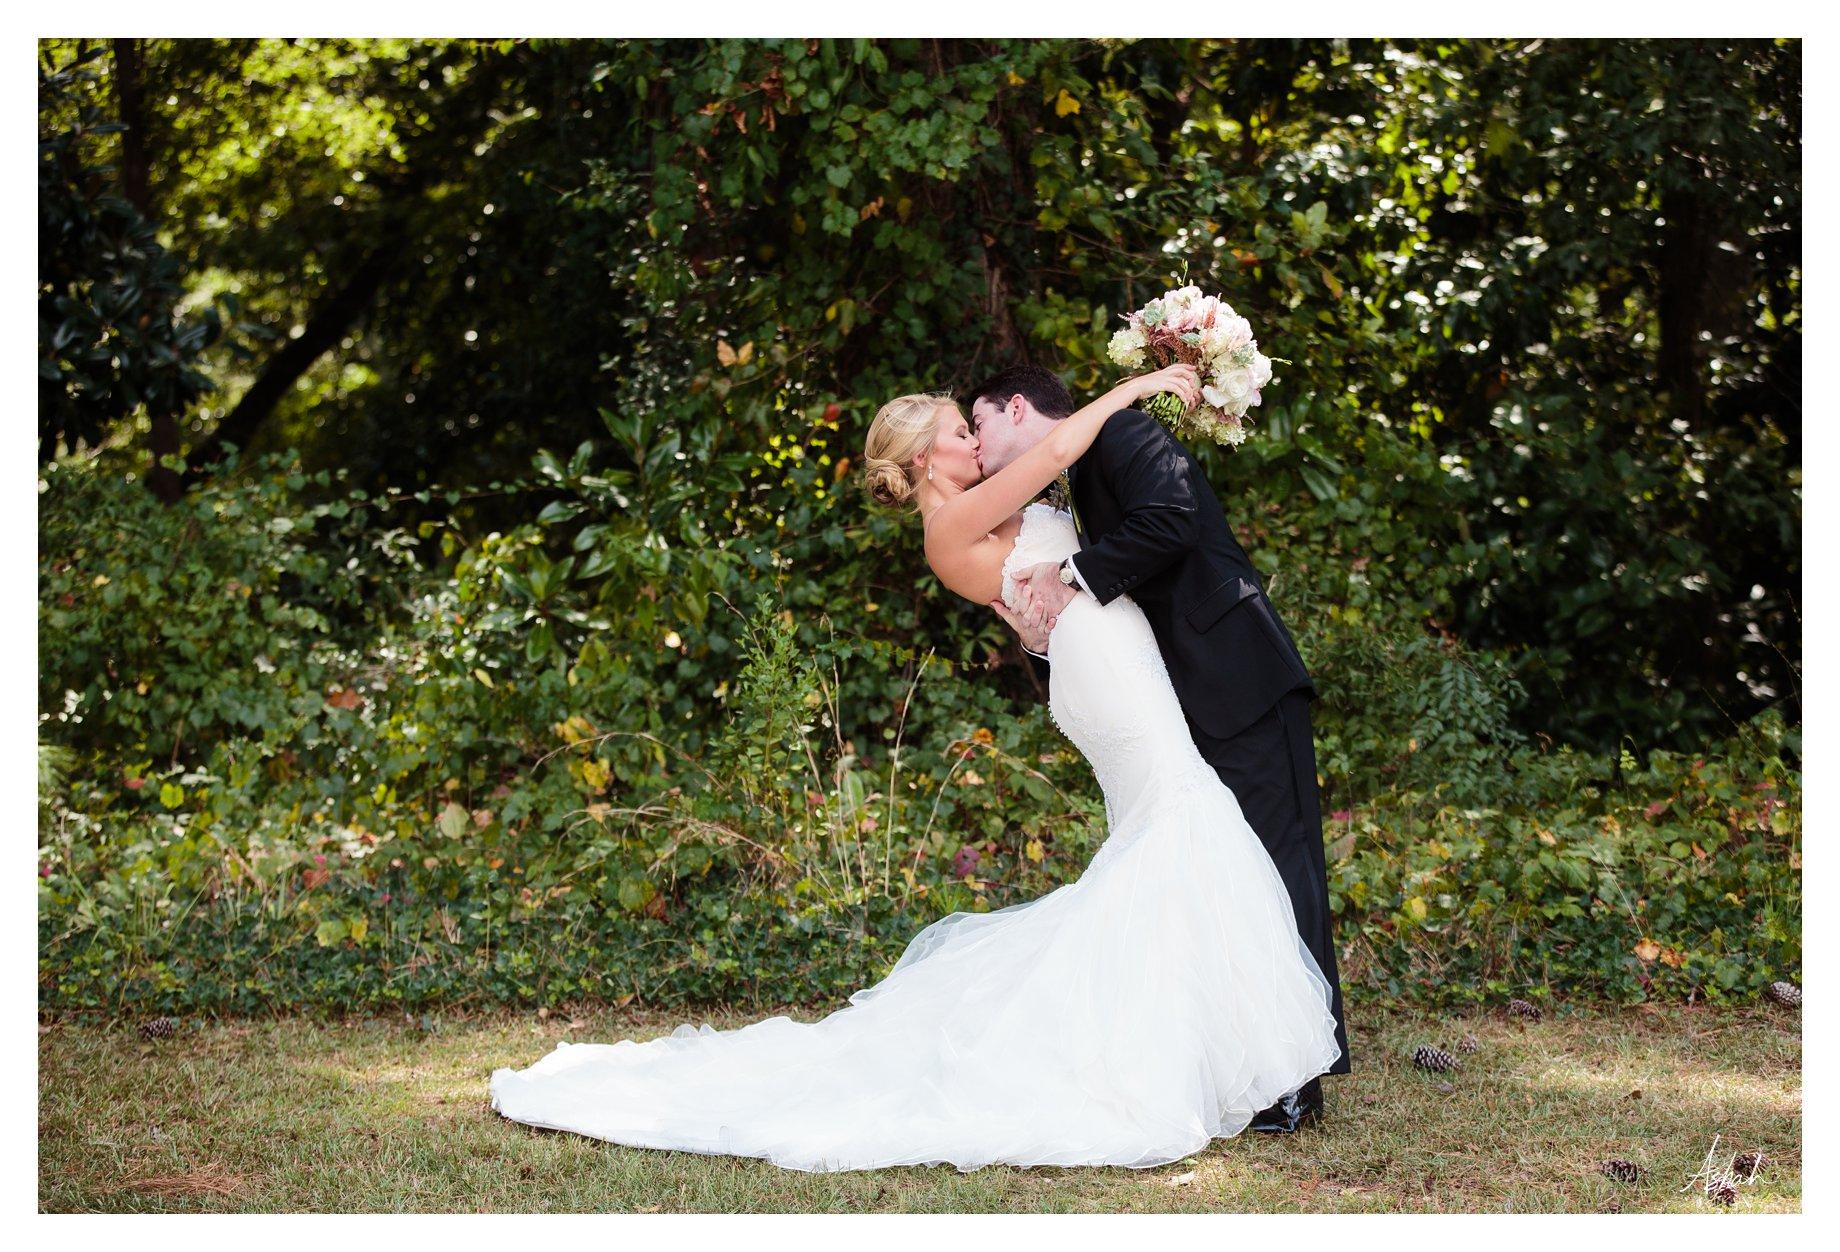 The Kiss - Macon Wedding Photographer